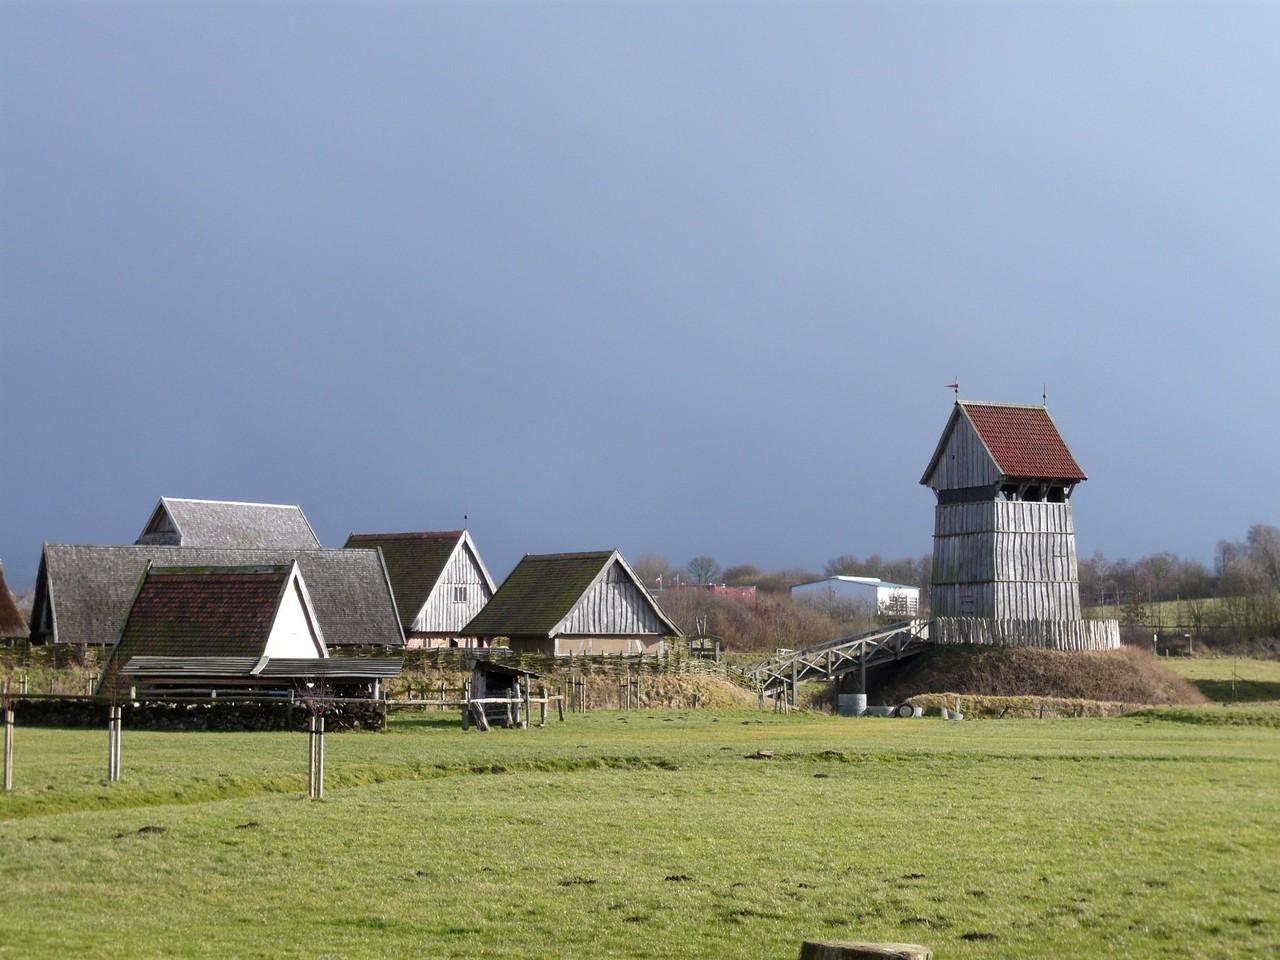 Lütjenburg, Ausbauphase 2007